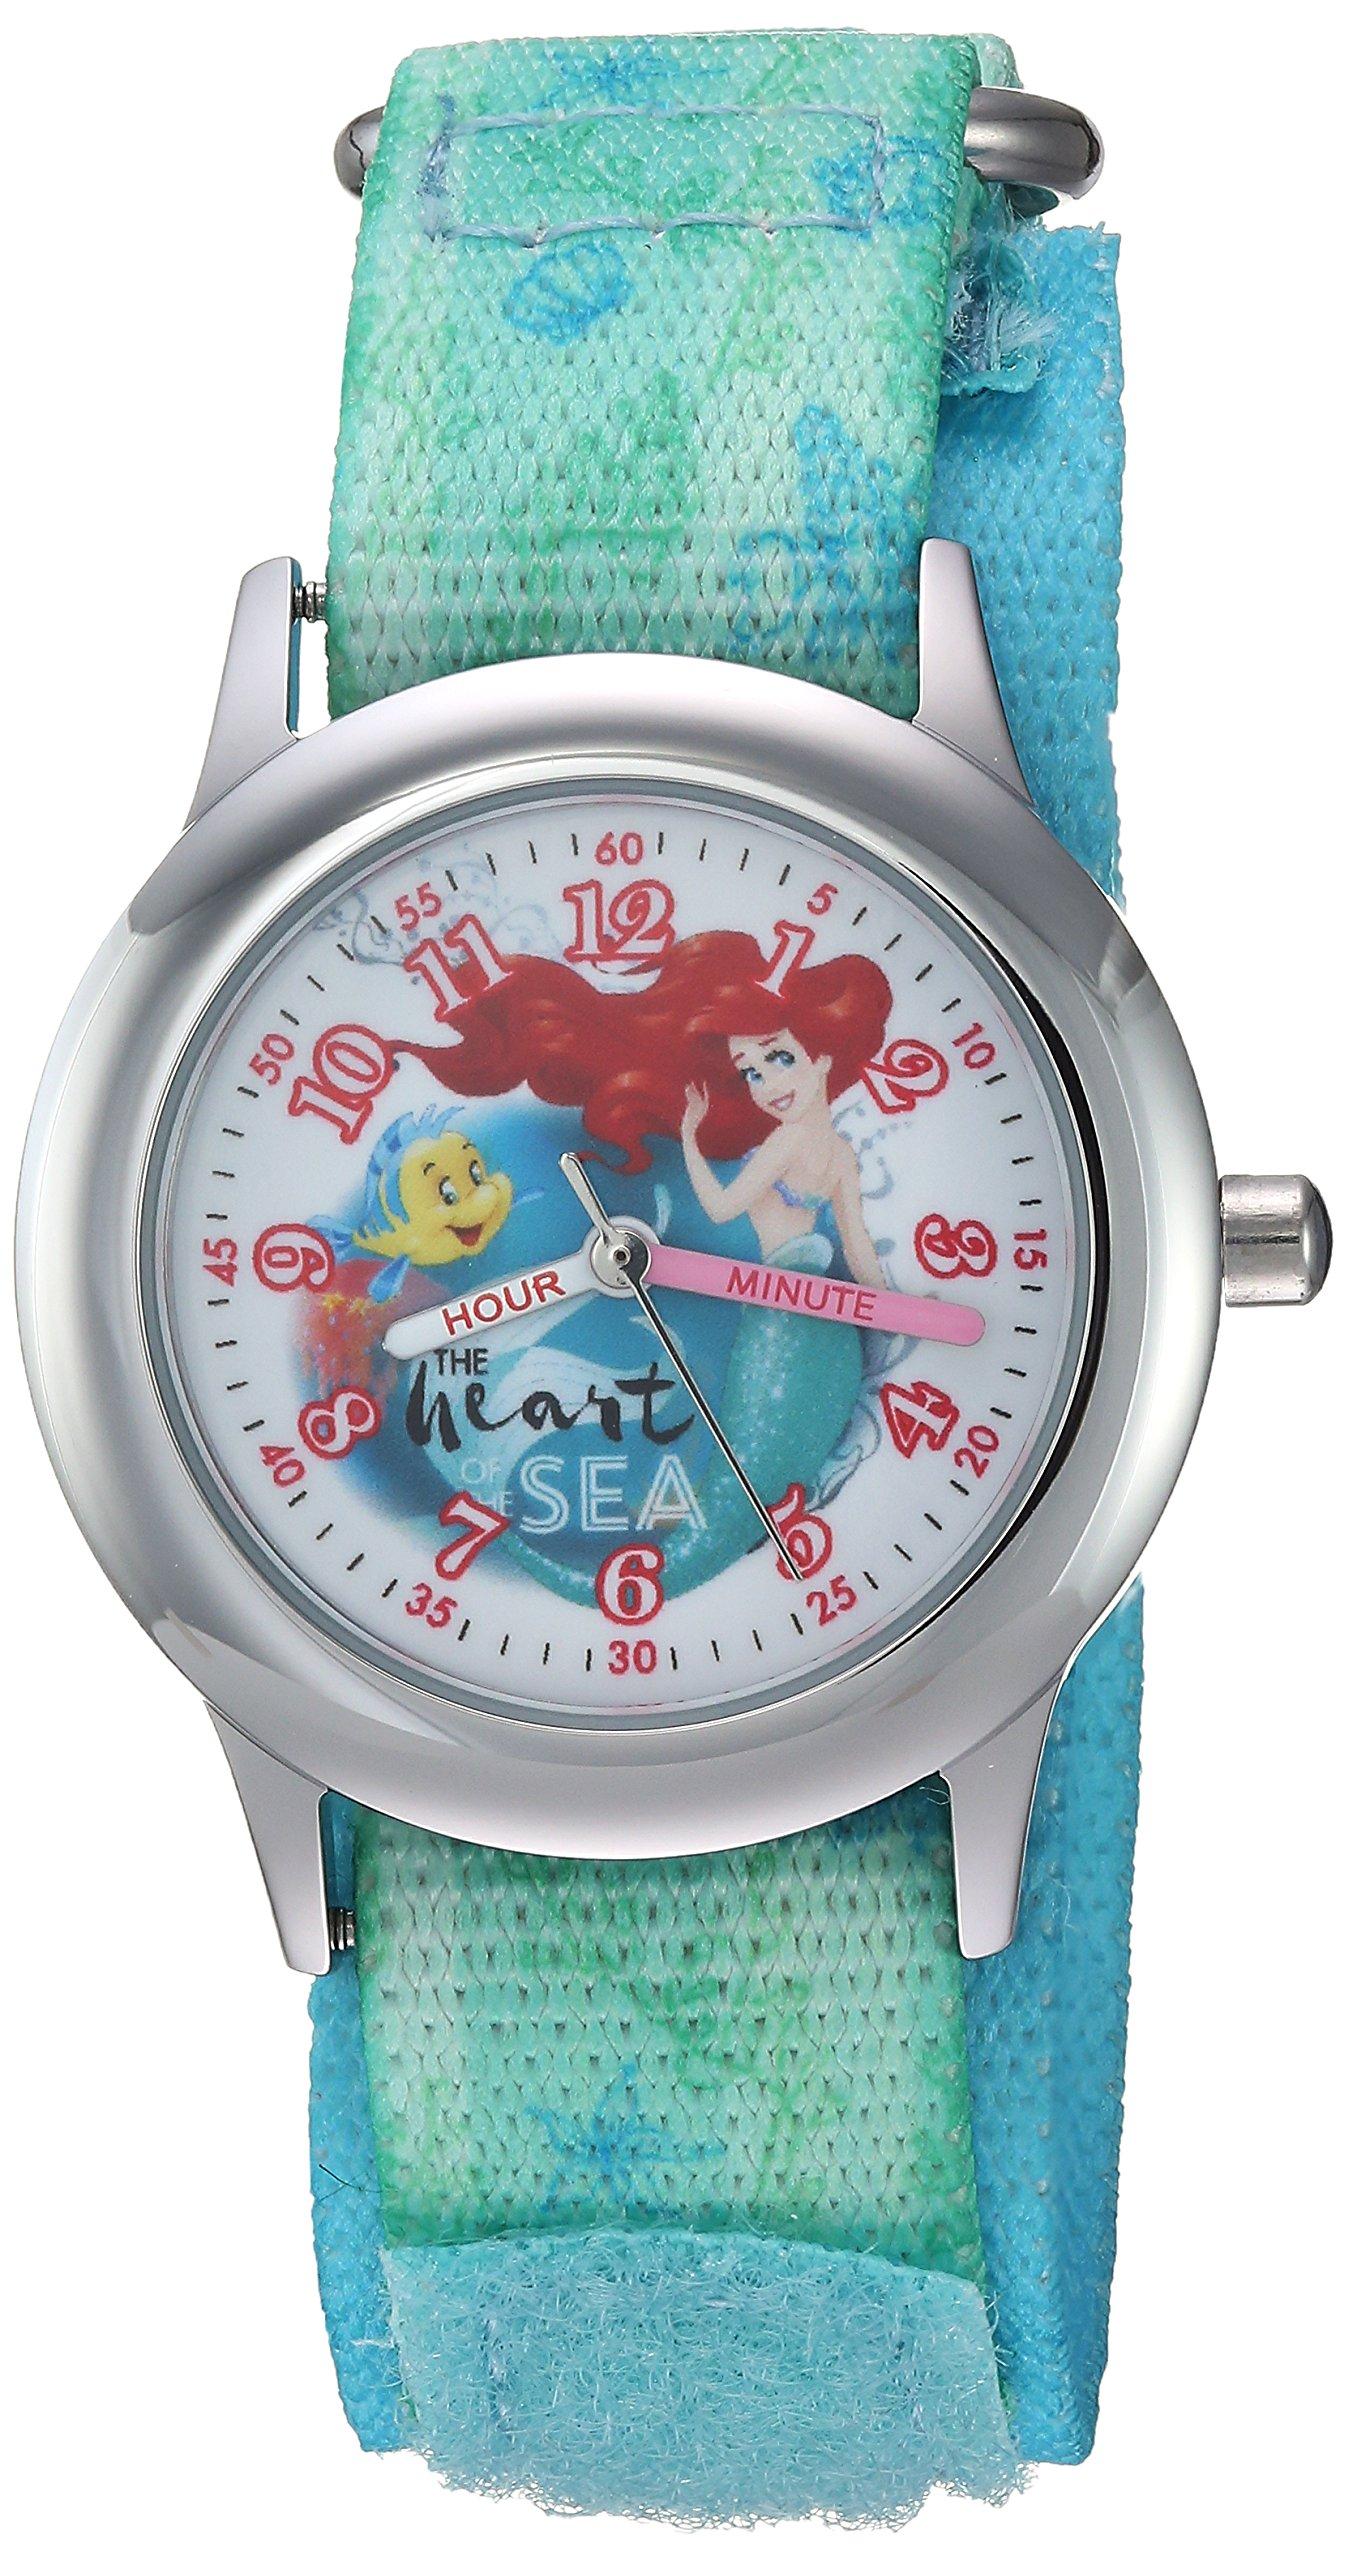 DISNEY Girls Princess Ariel Stainless Steel Analog-Quartz Watch with Nylon Strap, Green, 20 (Model: WDS000203) by Disney